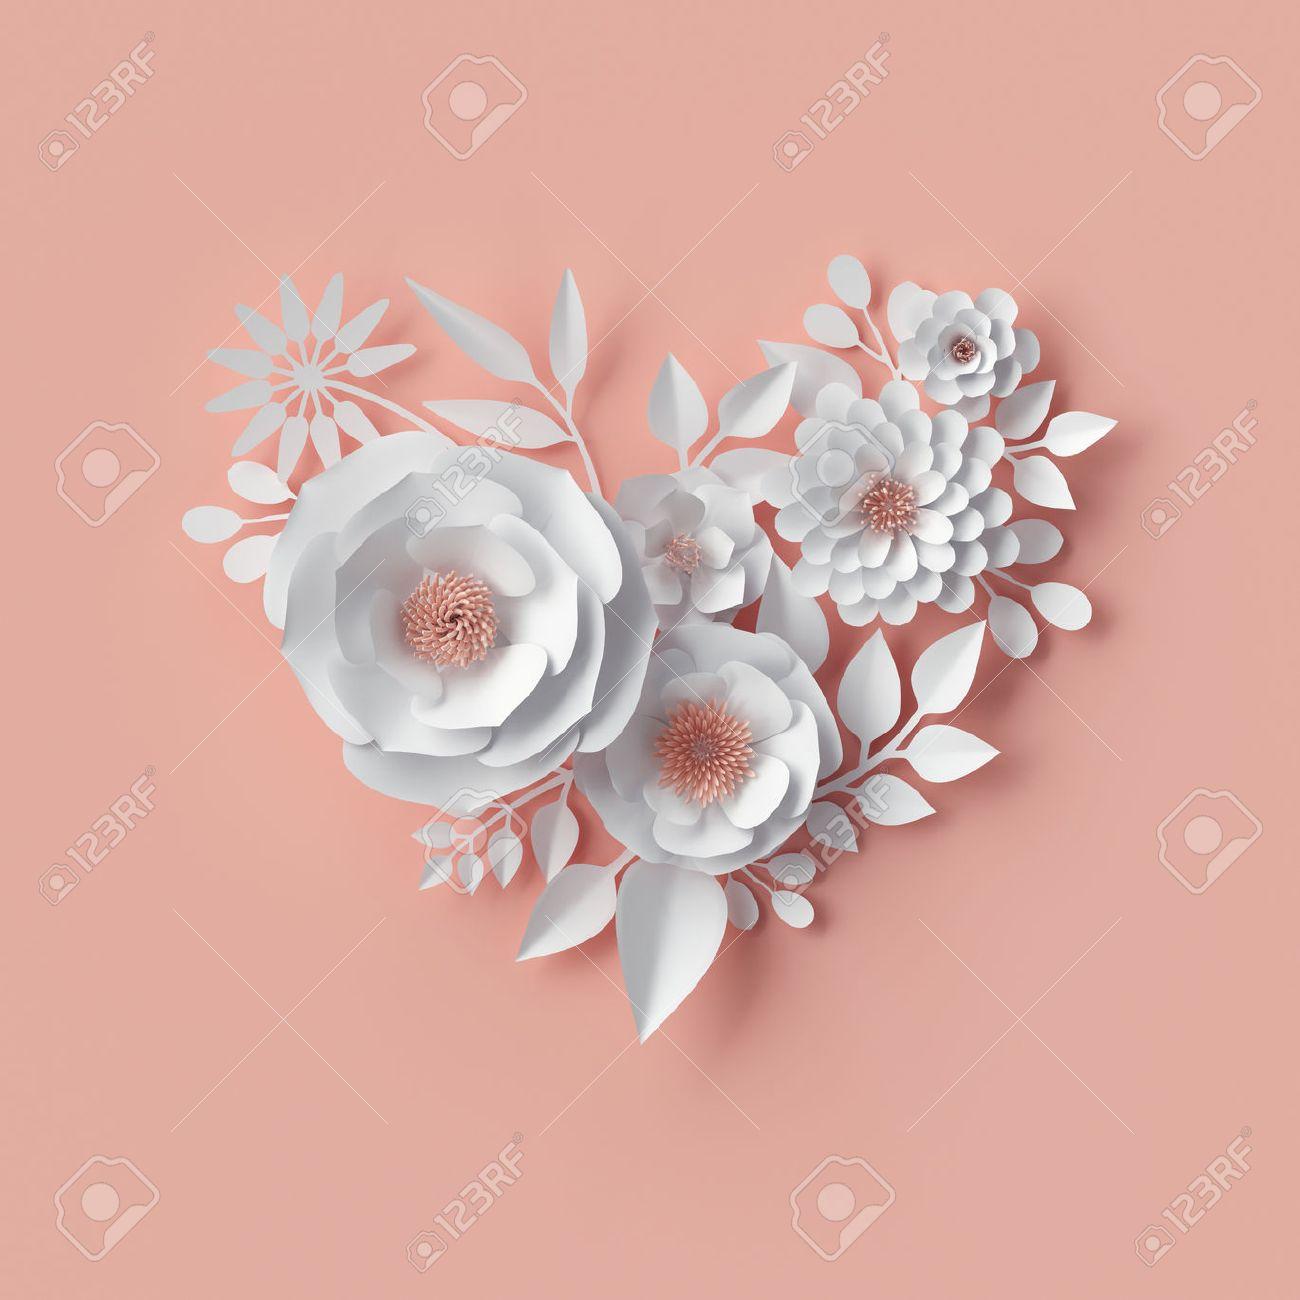 3d Render, Digital Illustration, White Paper Flowers, Blush Pink Wall Decor,  Floral